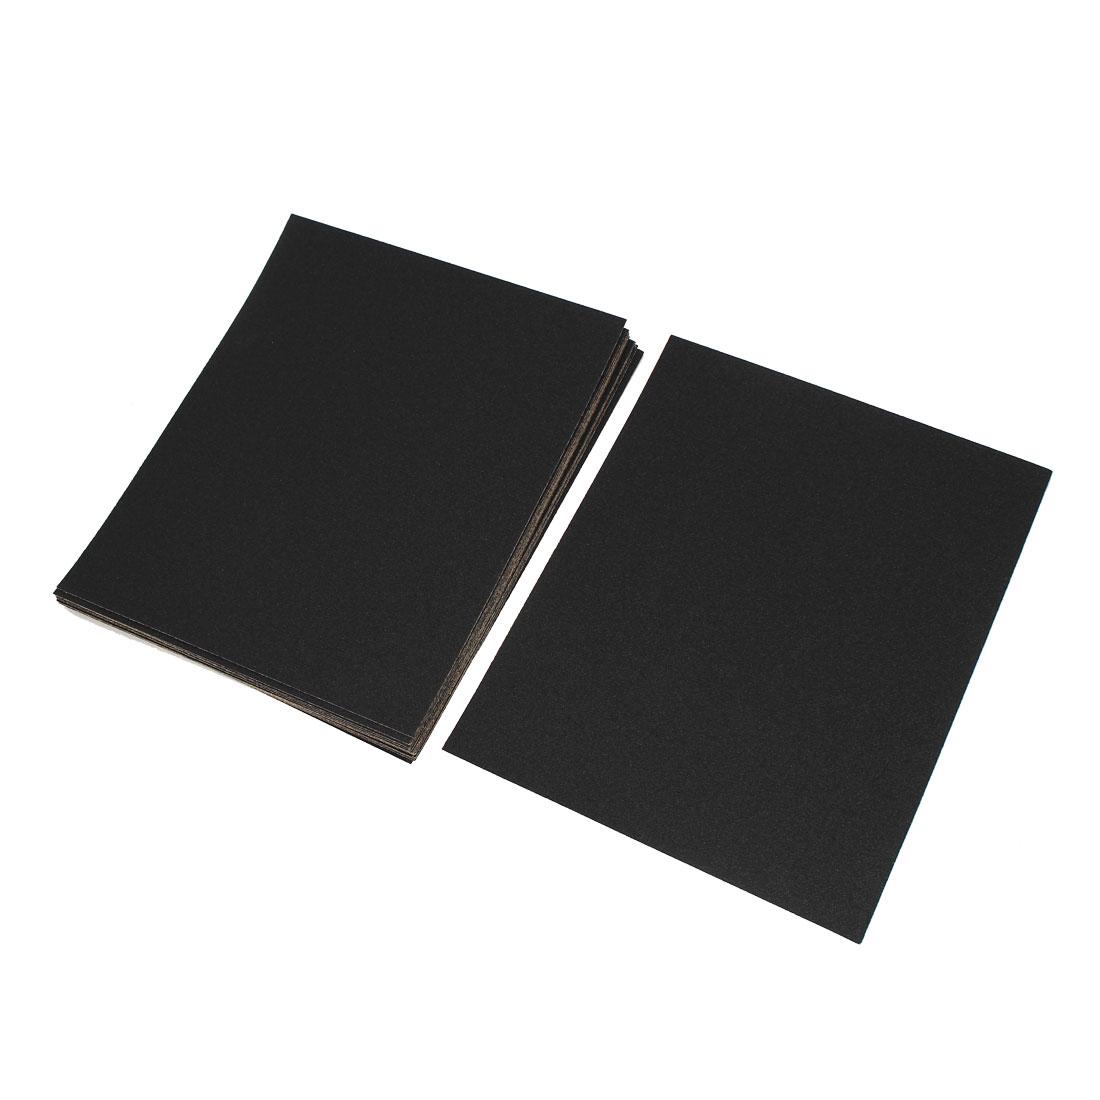 Silicone Carbide Wet Dry Abrasive Sandpapers Burnishing 120 Grit 20pcs